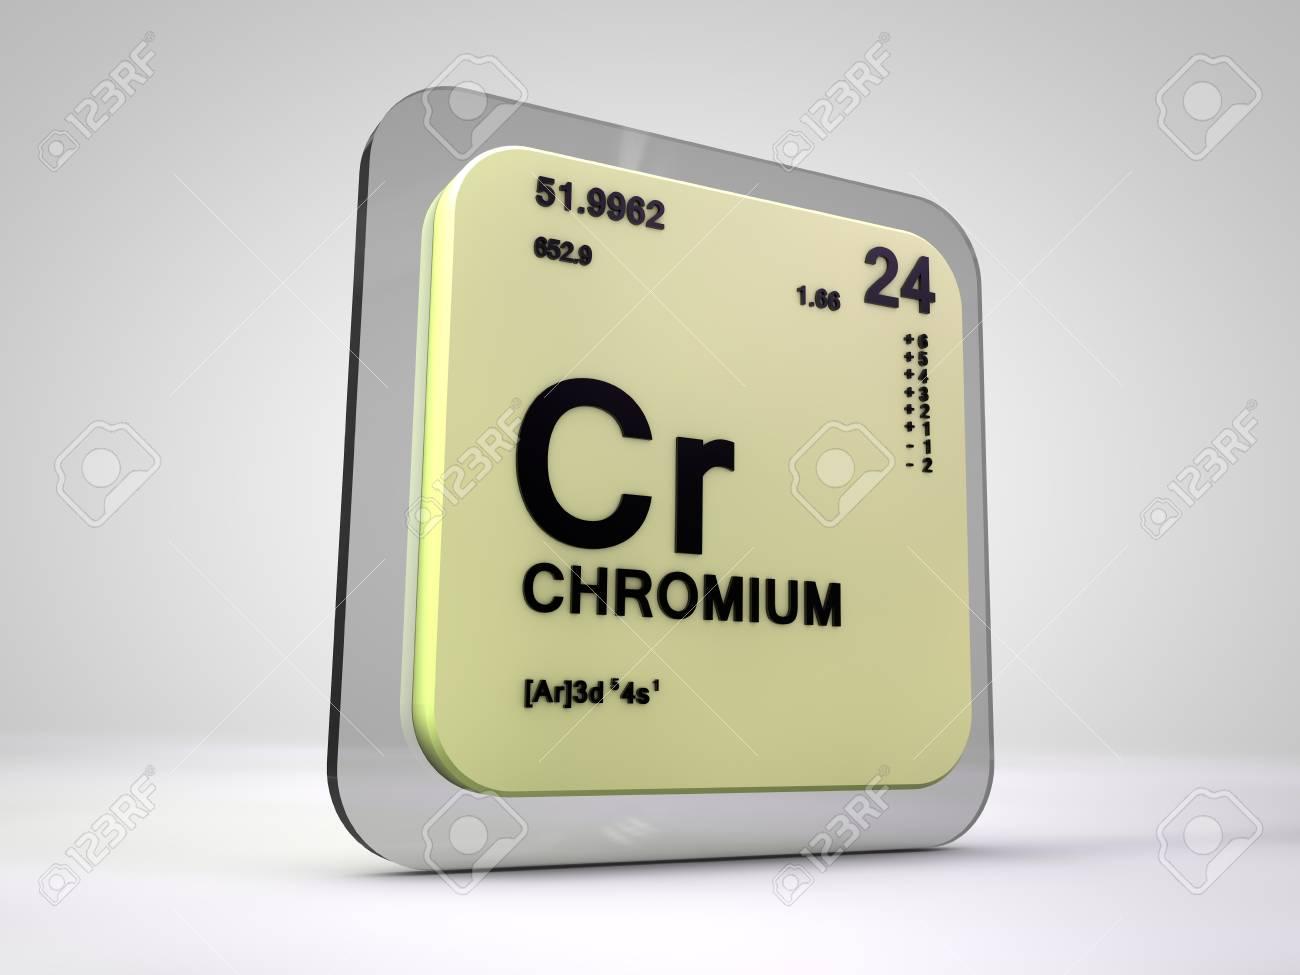 Chromium Cr Chemical Element Periodic Table 3d Render Stock